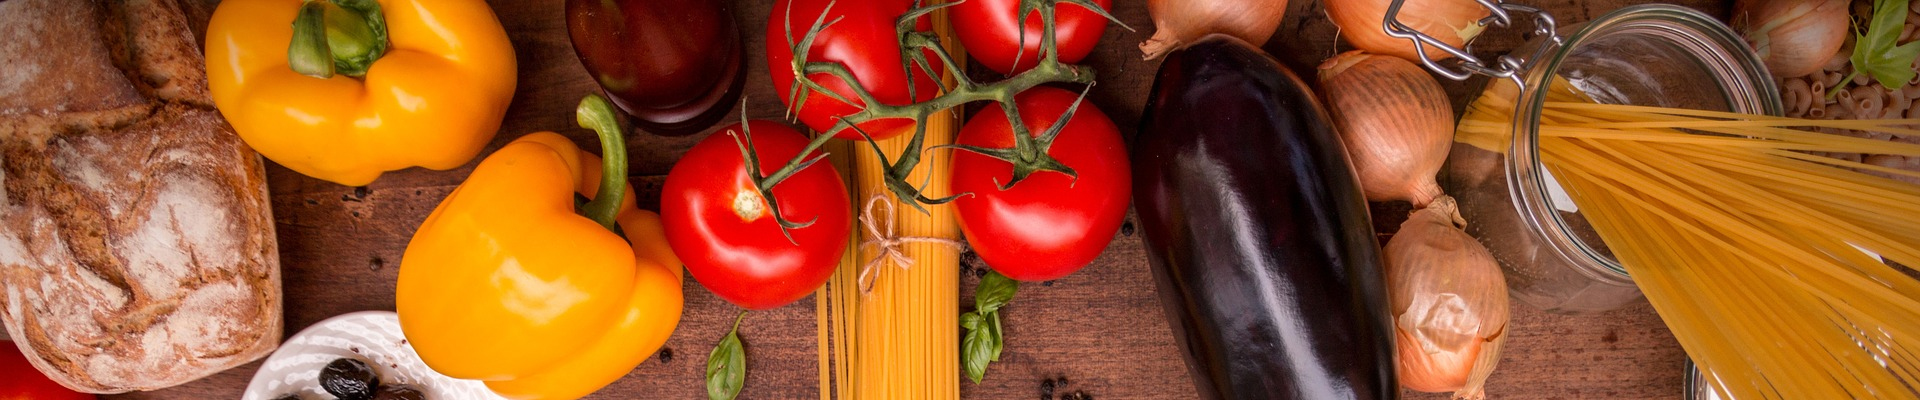 Symbolbild Ernährung: Spaghetti, Tomaten, Paprika, Aubergine, Basilikum, Credit: Pixabay